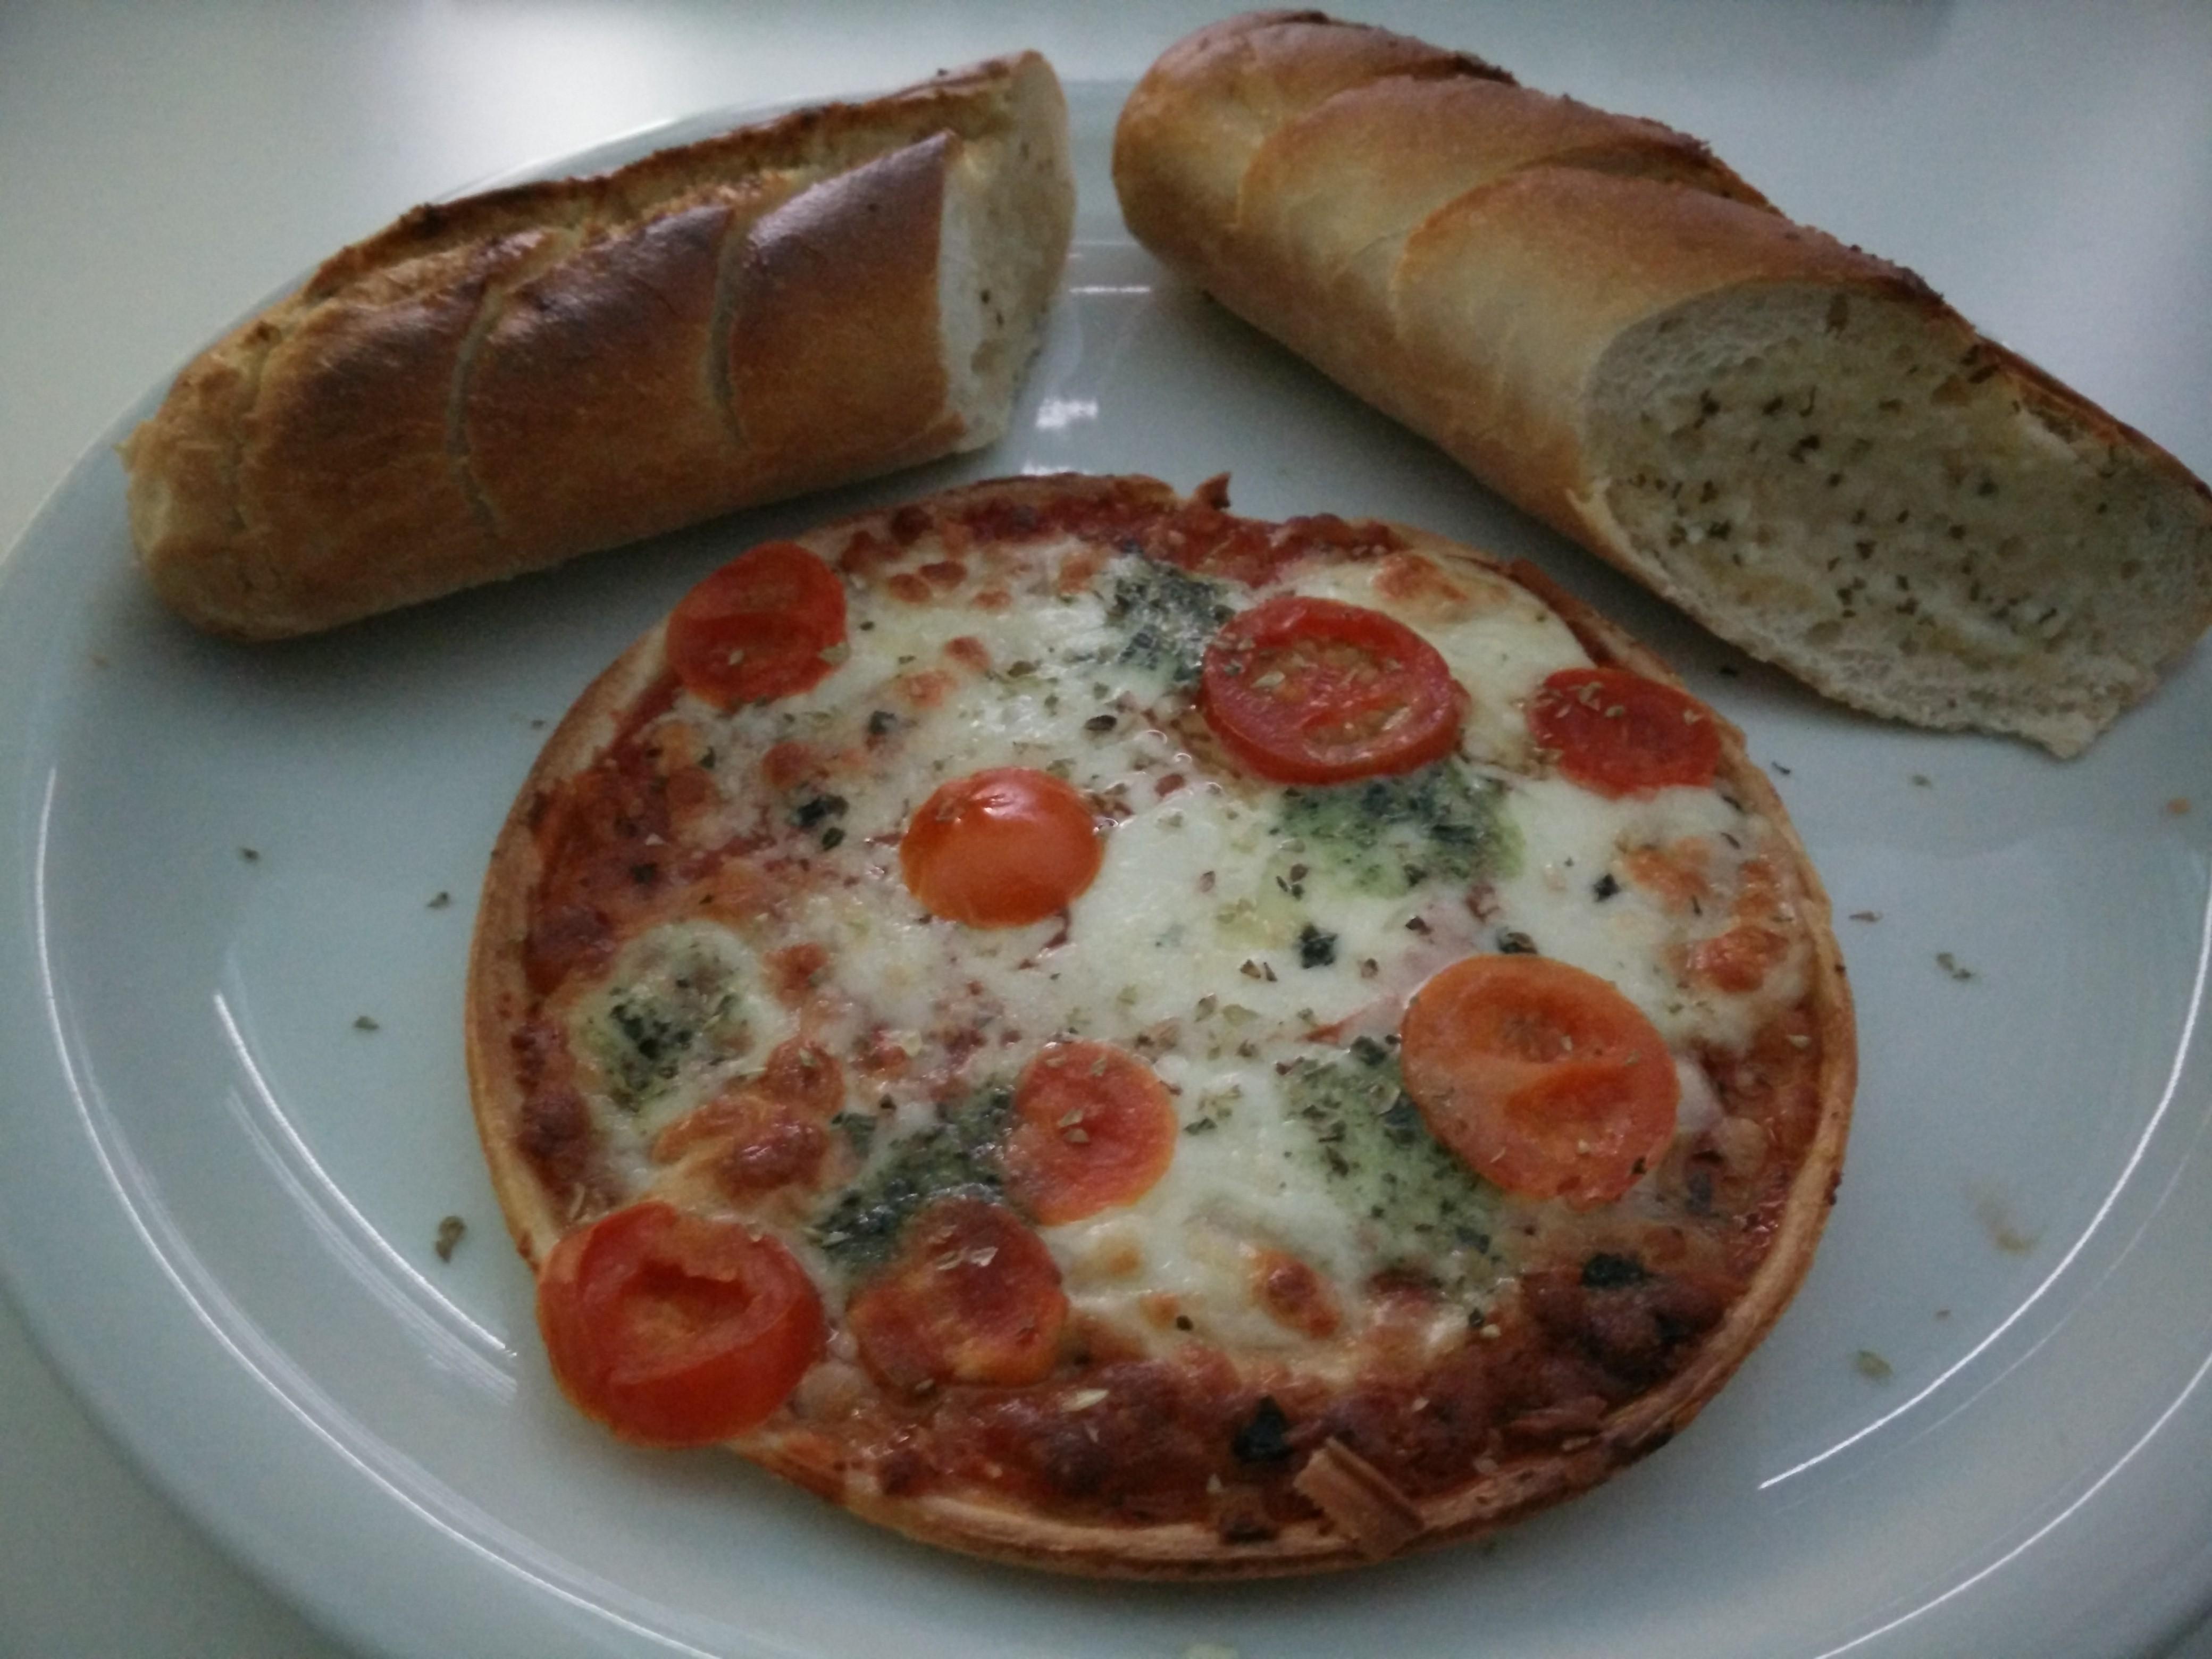 http://foodloader.net/Holz_2016-02-07_Pizza_und_Knoblauchbaguette.jpg